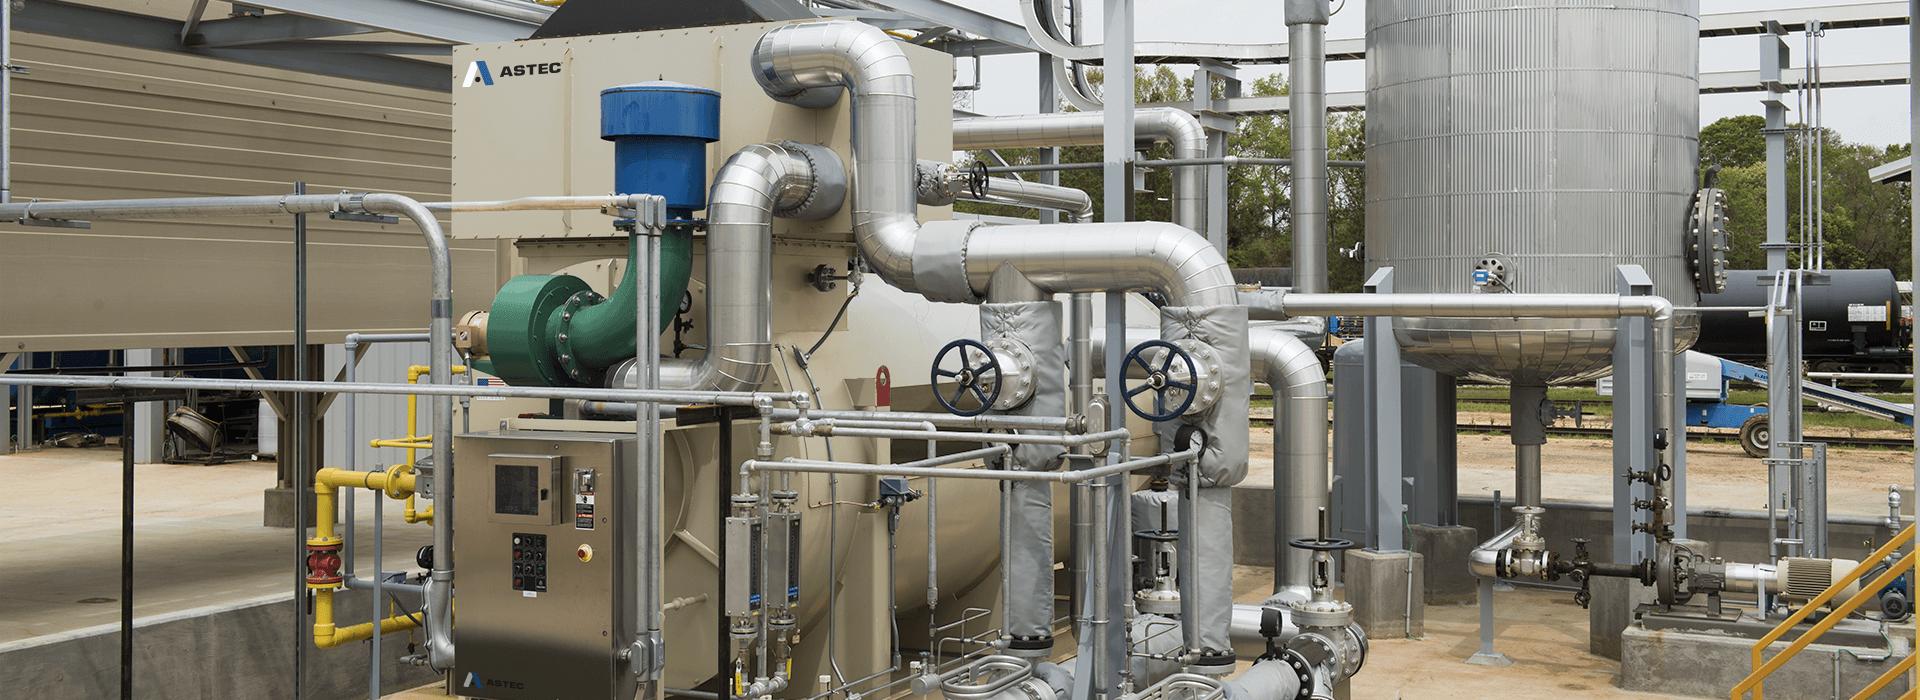 Heatec HCI Industrial Heater